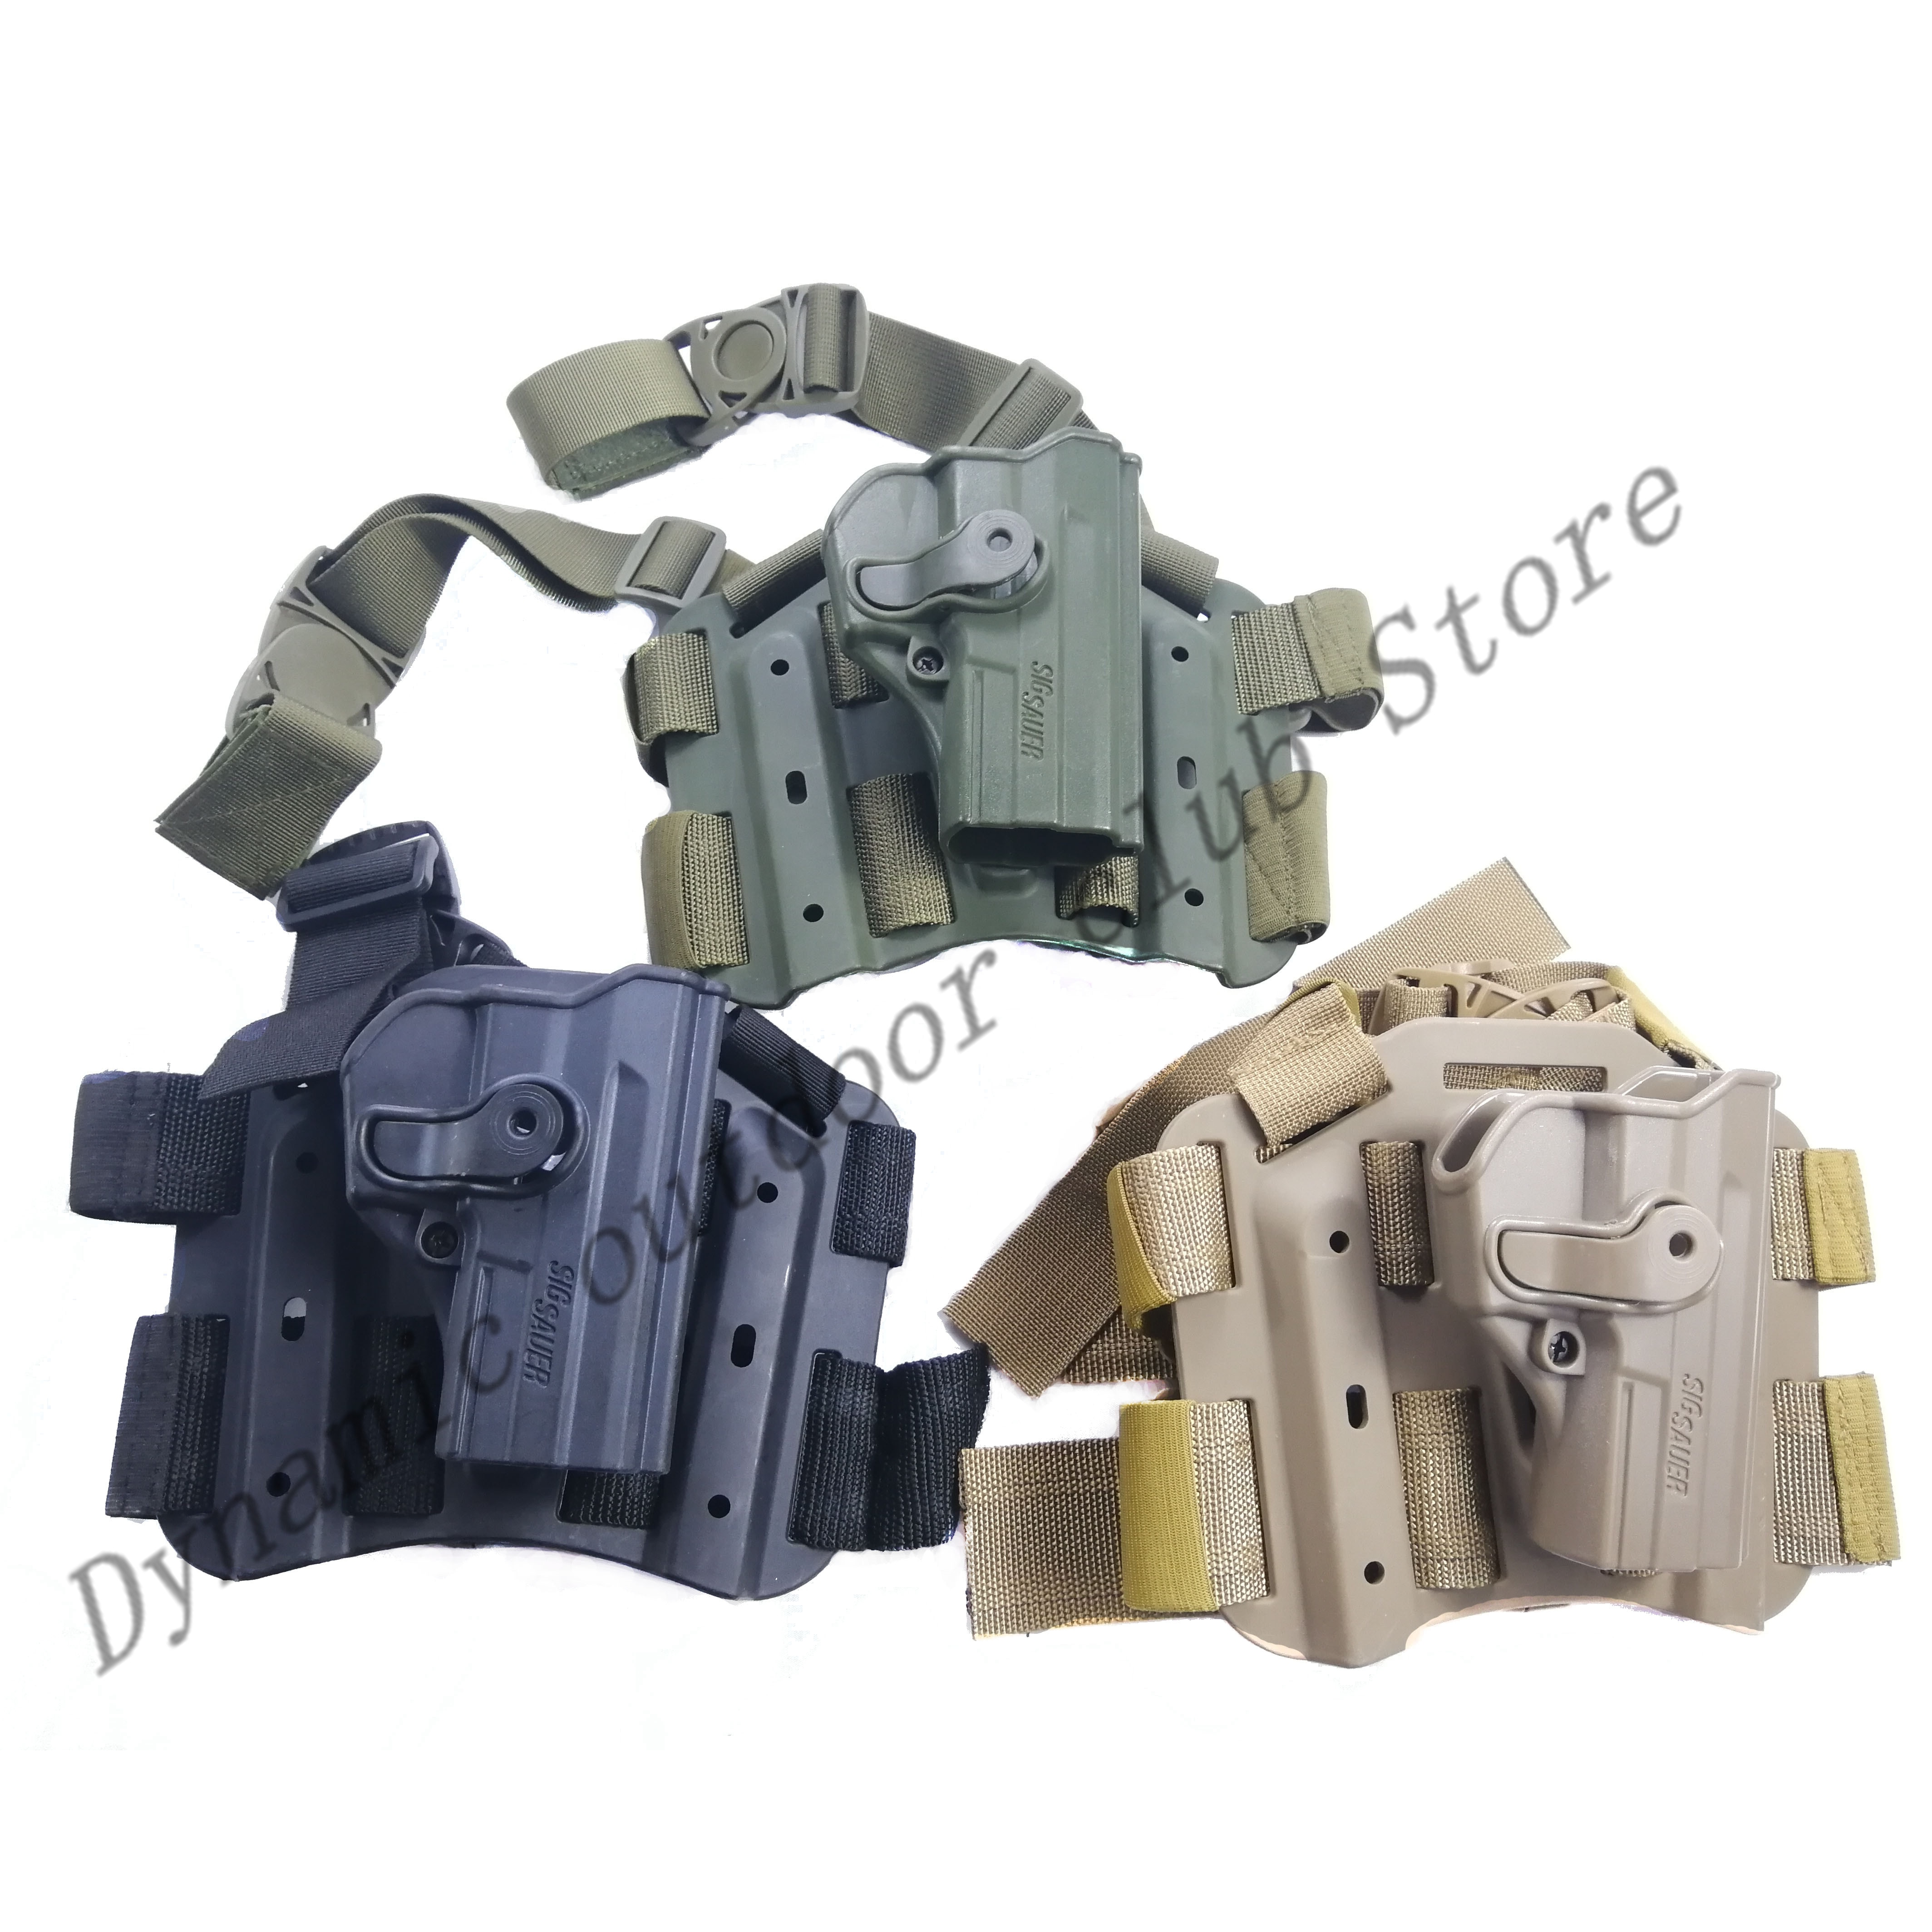 Pro gota perna coxa caso para pistola tática sig sauer sp2022 p220 p09 armas militares airsoft pintura caça